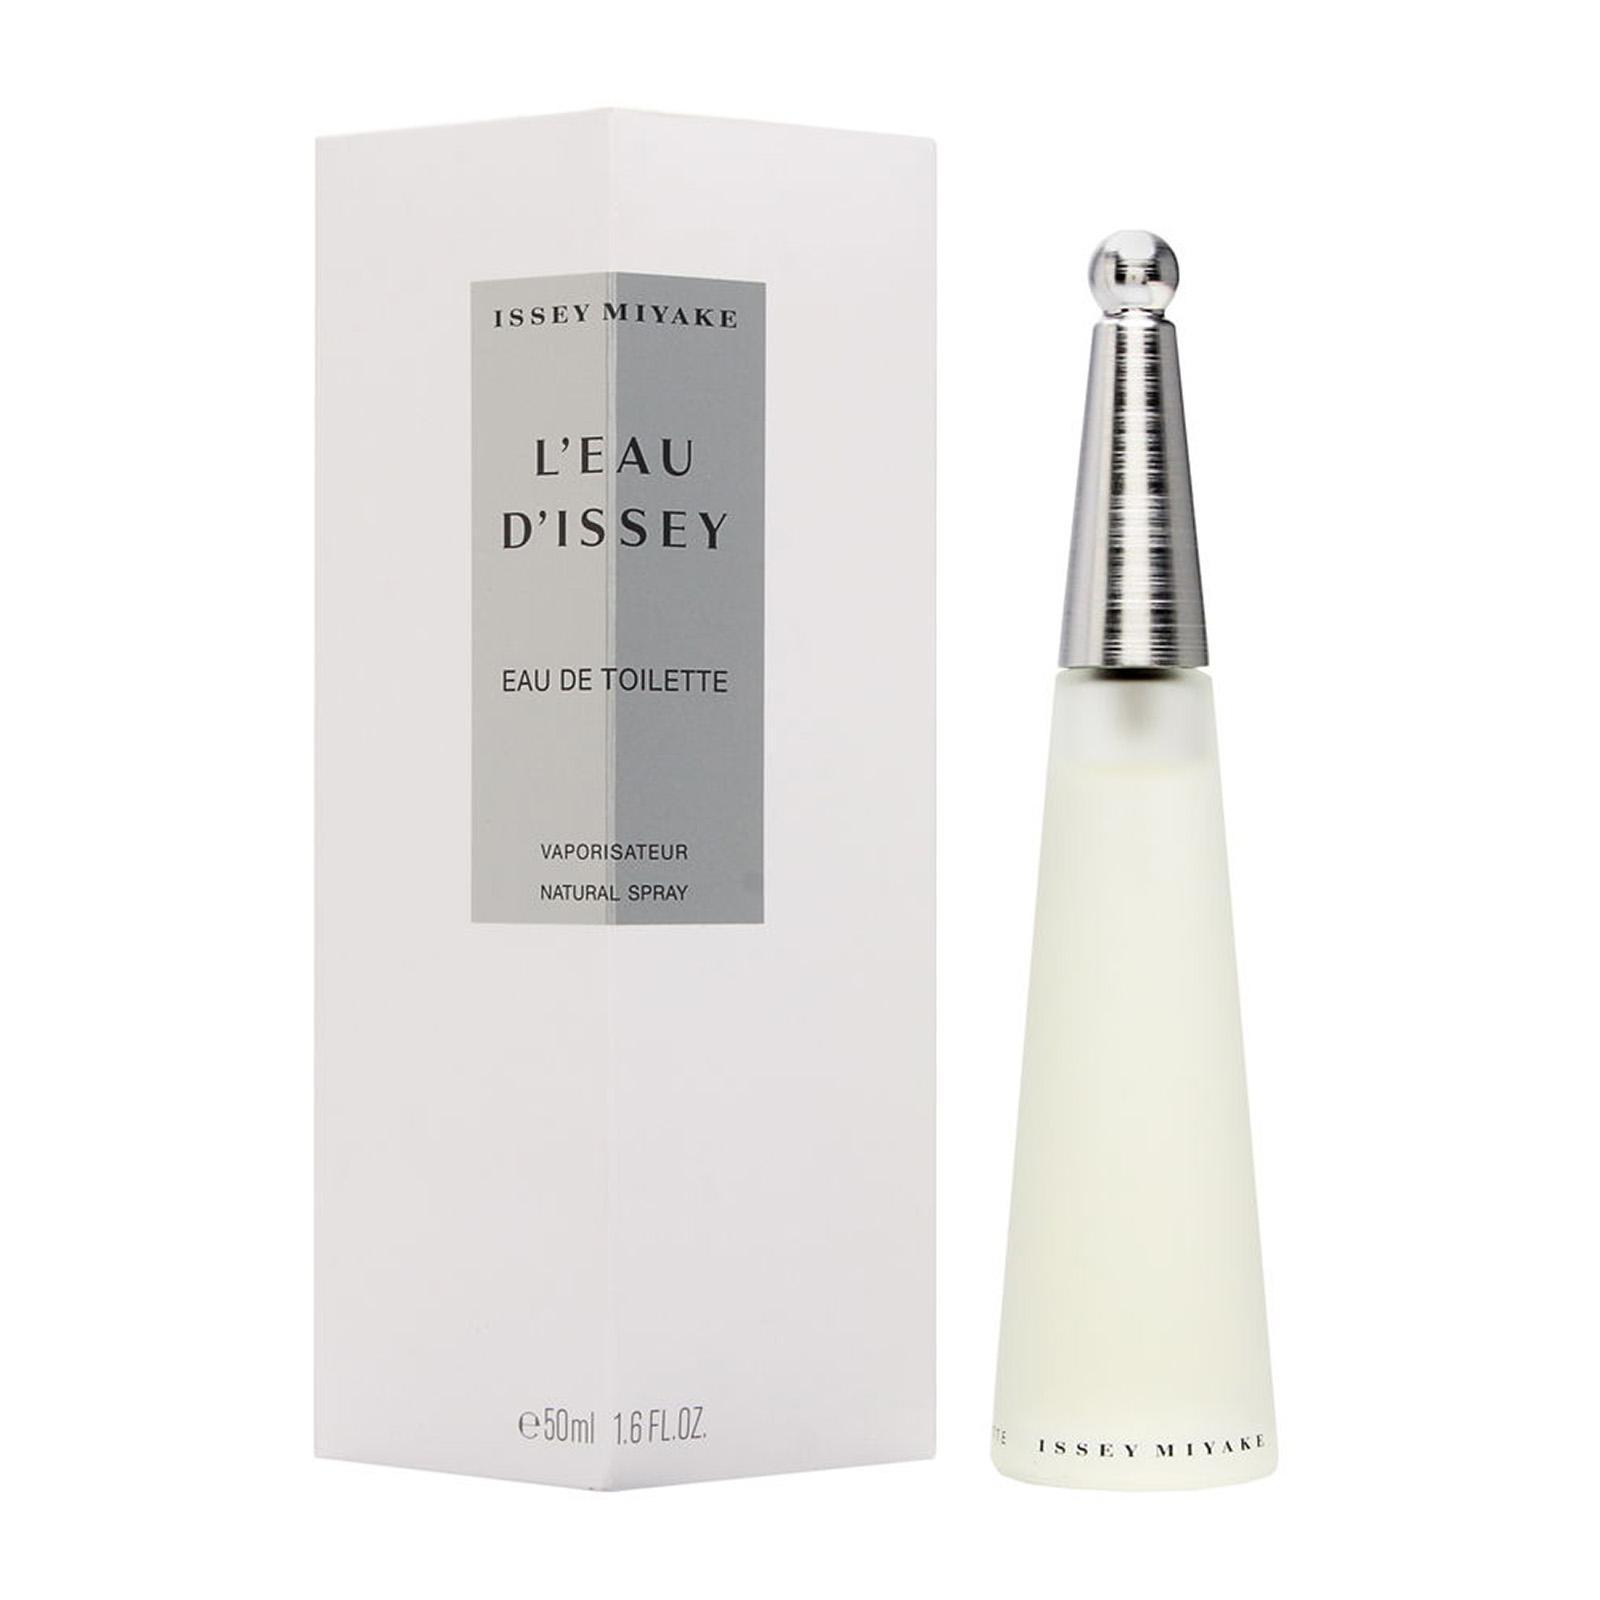 Issey Miyake L'Eau D'Issey For Women Eau De Toilette Perfme Fragrance Spray - By BEAULUXLAB